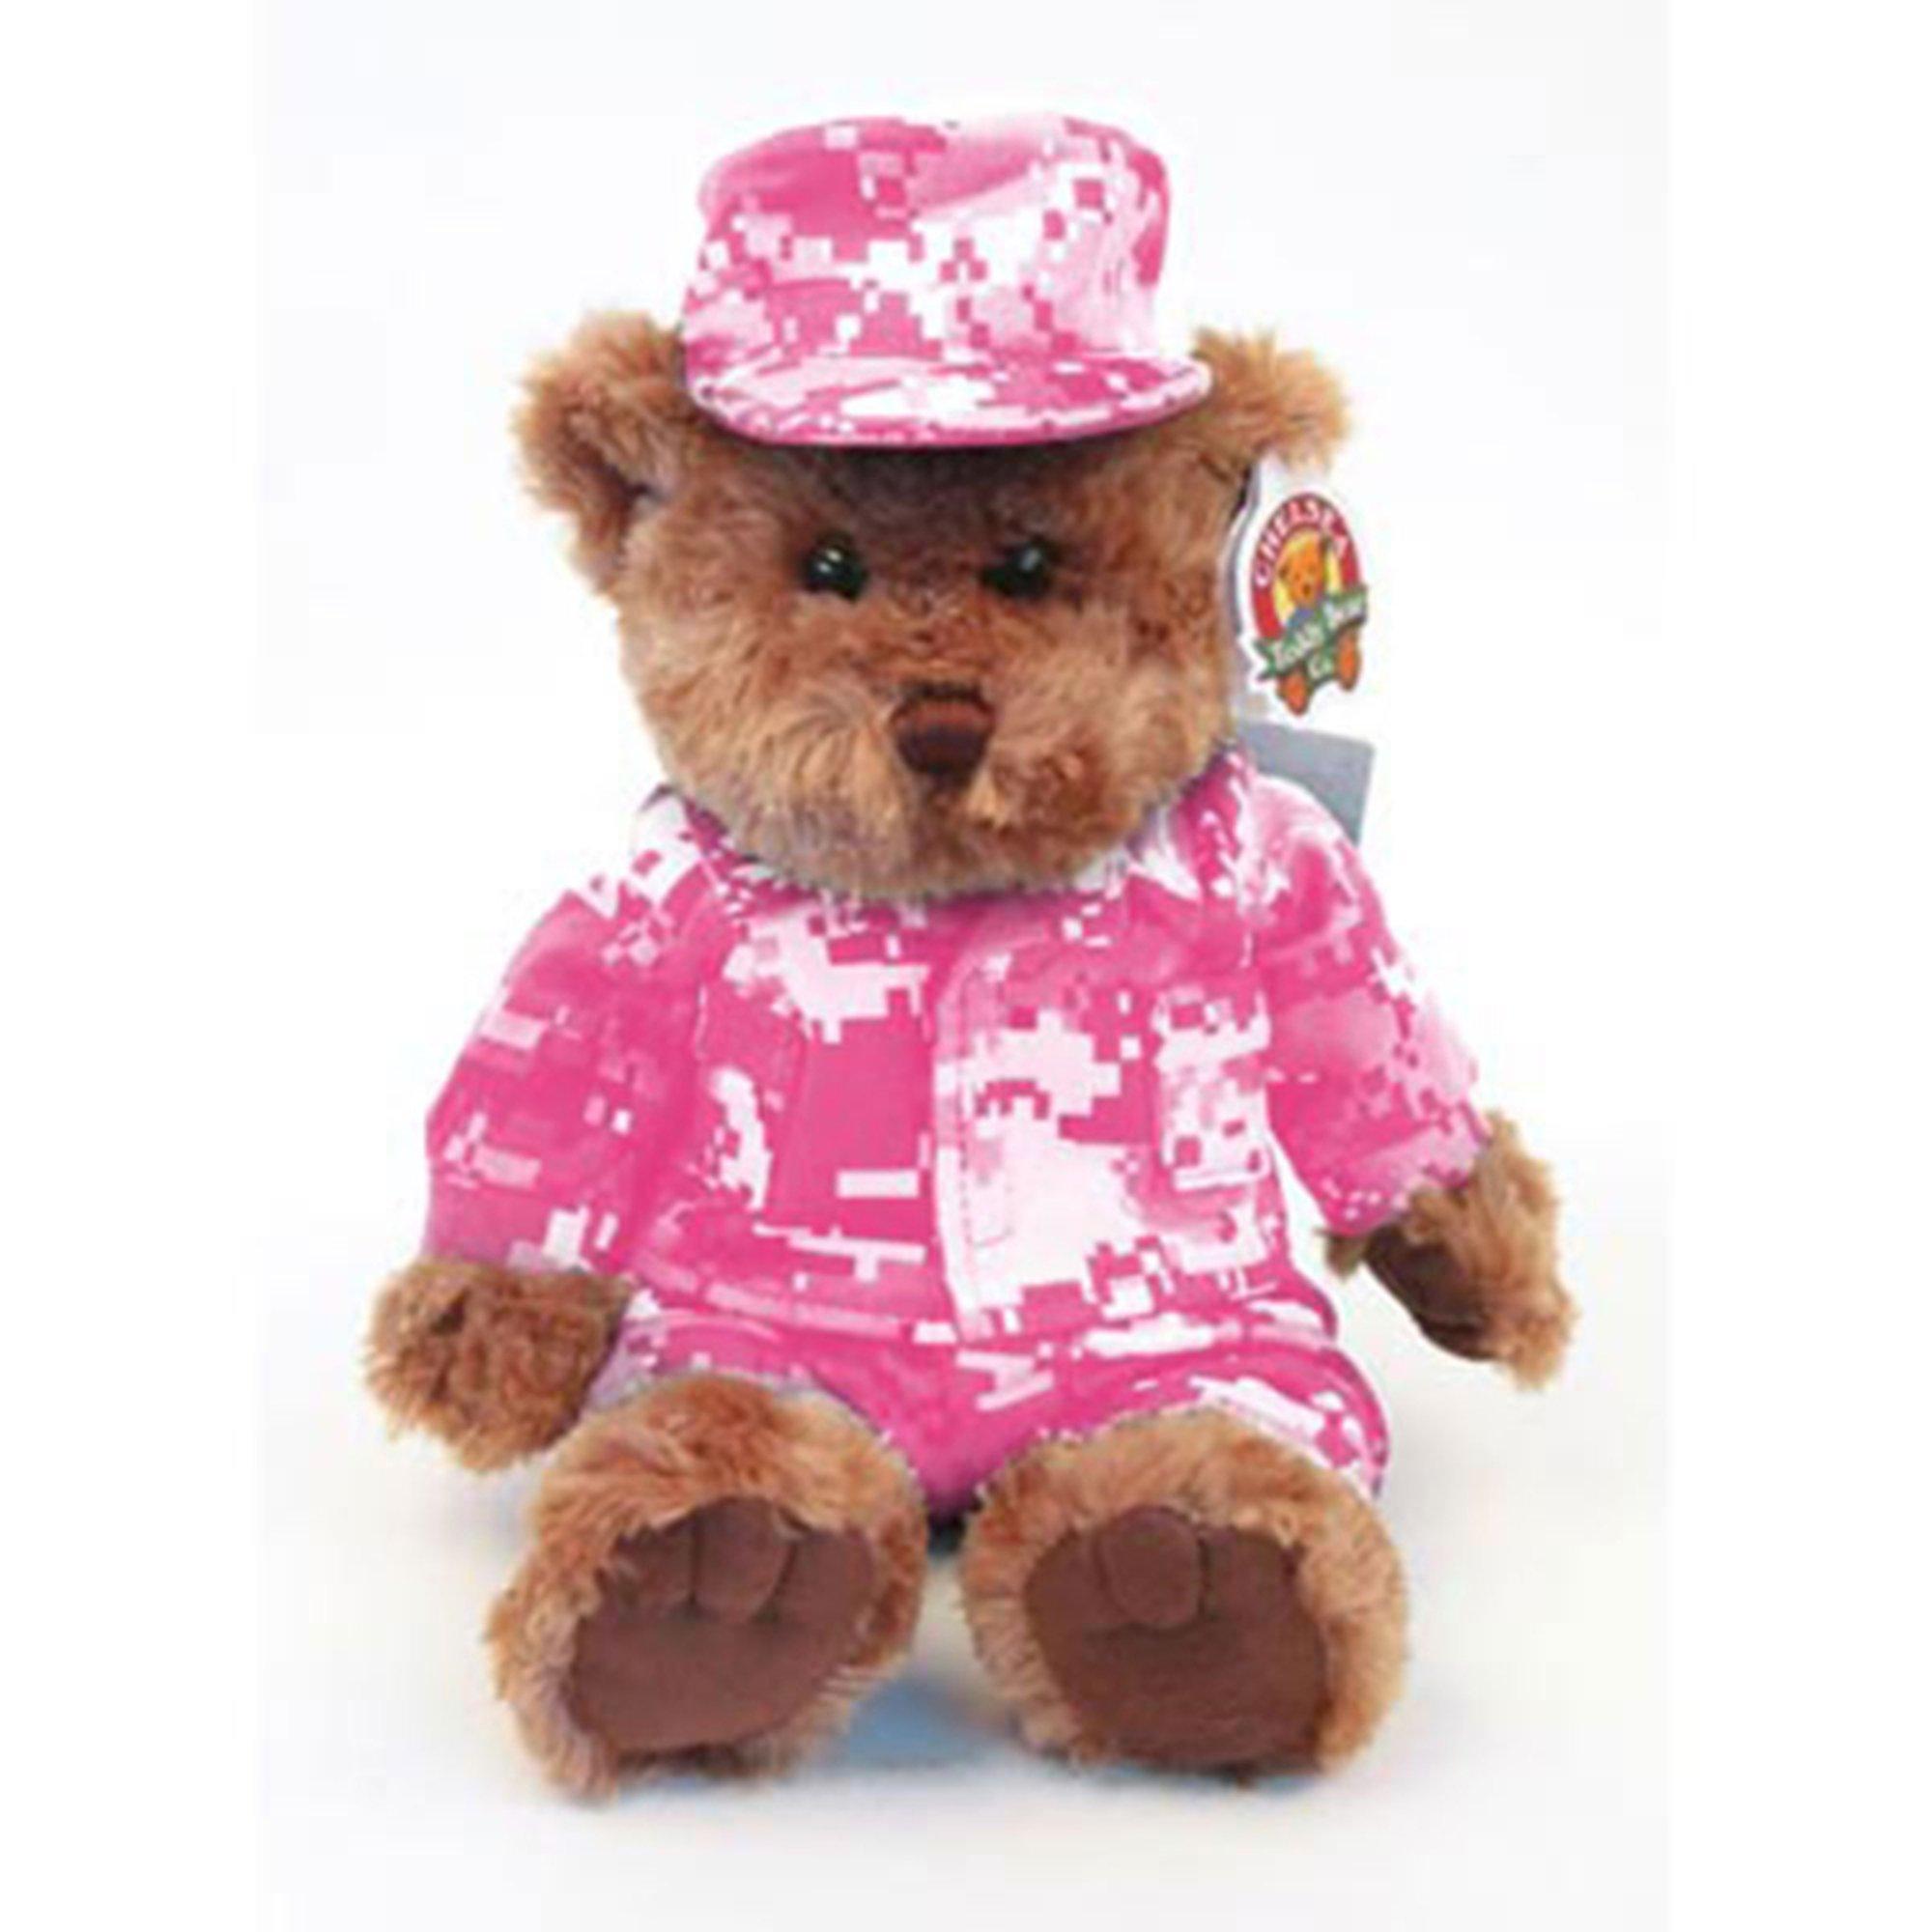 chelsea teddy bear co usn 10 traditional bear stuffed animals